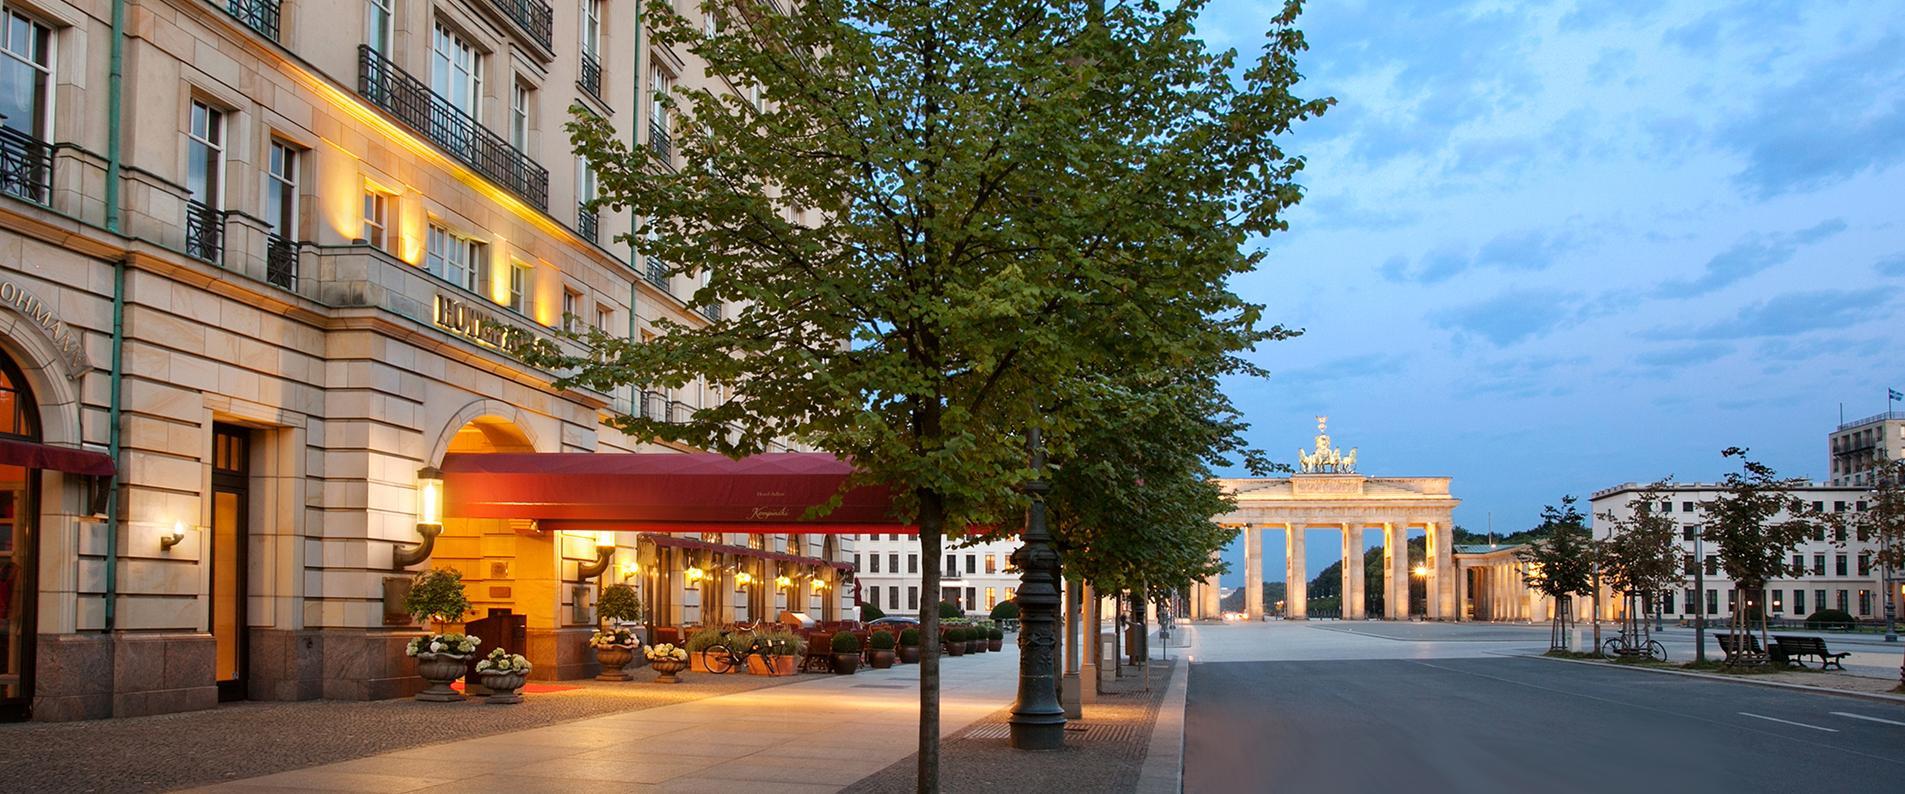 Adlon kempinski hotel geoffrey weill associates for Designhotel brandenburg